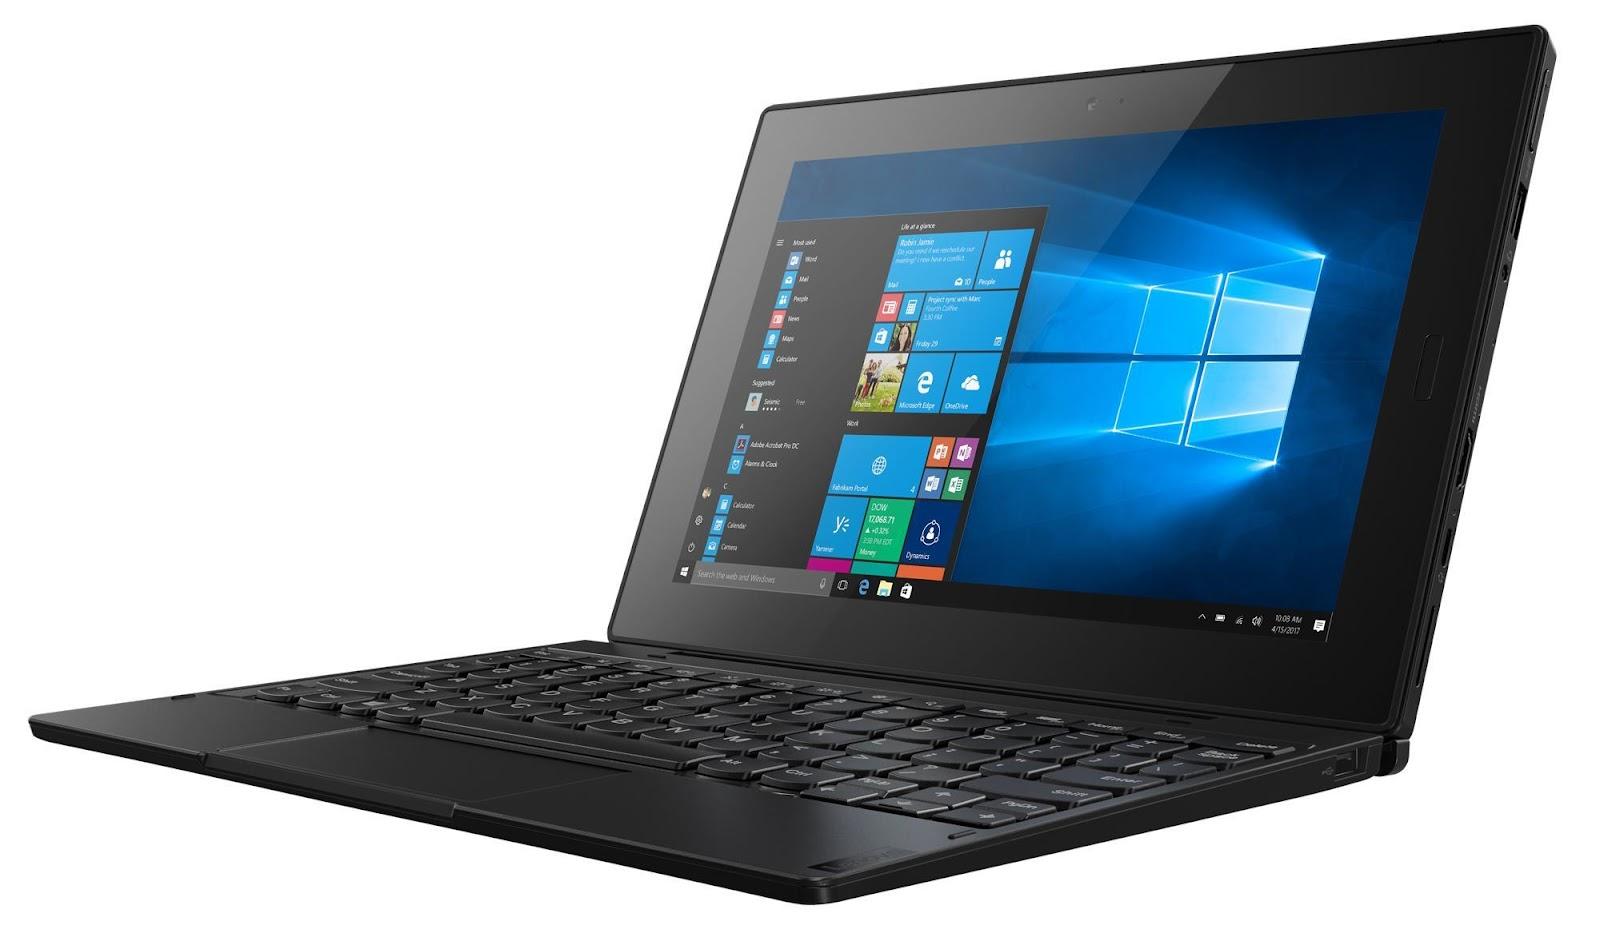 Фото 1. Планшет Lenovo Tablet 10 8/128 WiFi Black (20L3000MRT)